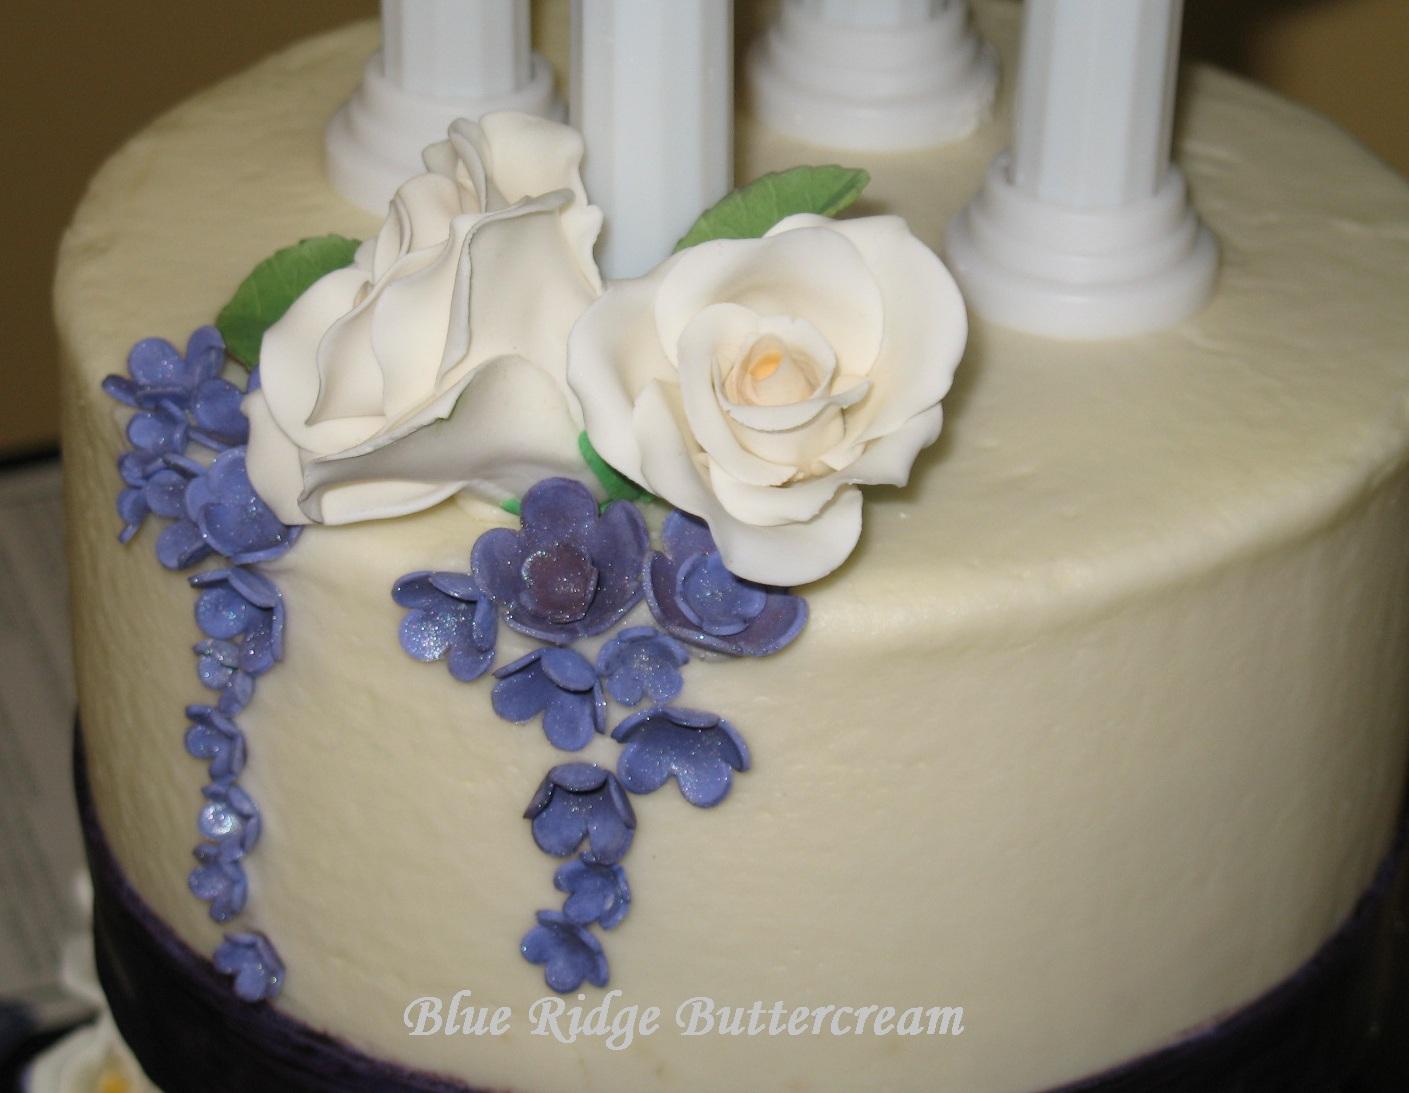 Round Wedding Cakes Blue Ridge Buttercream